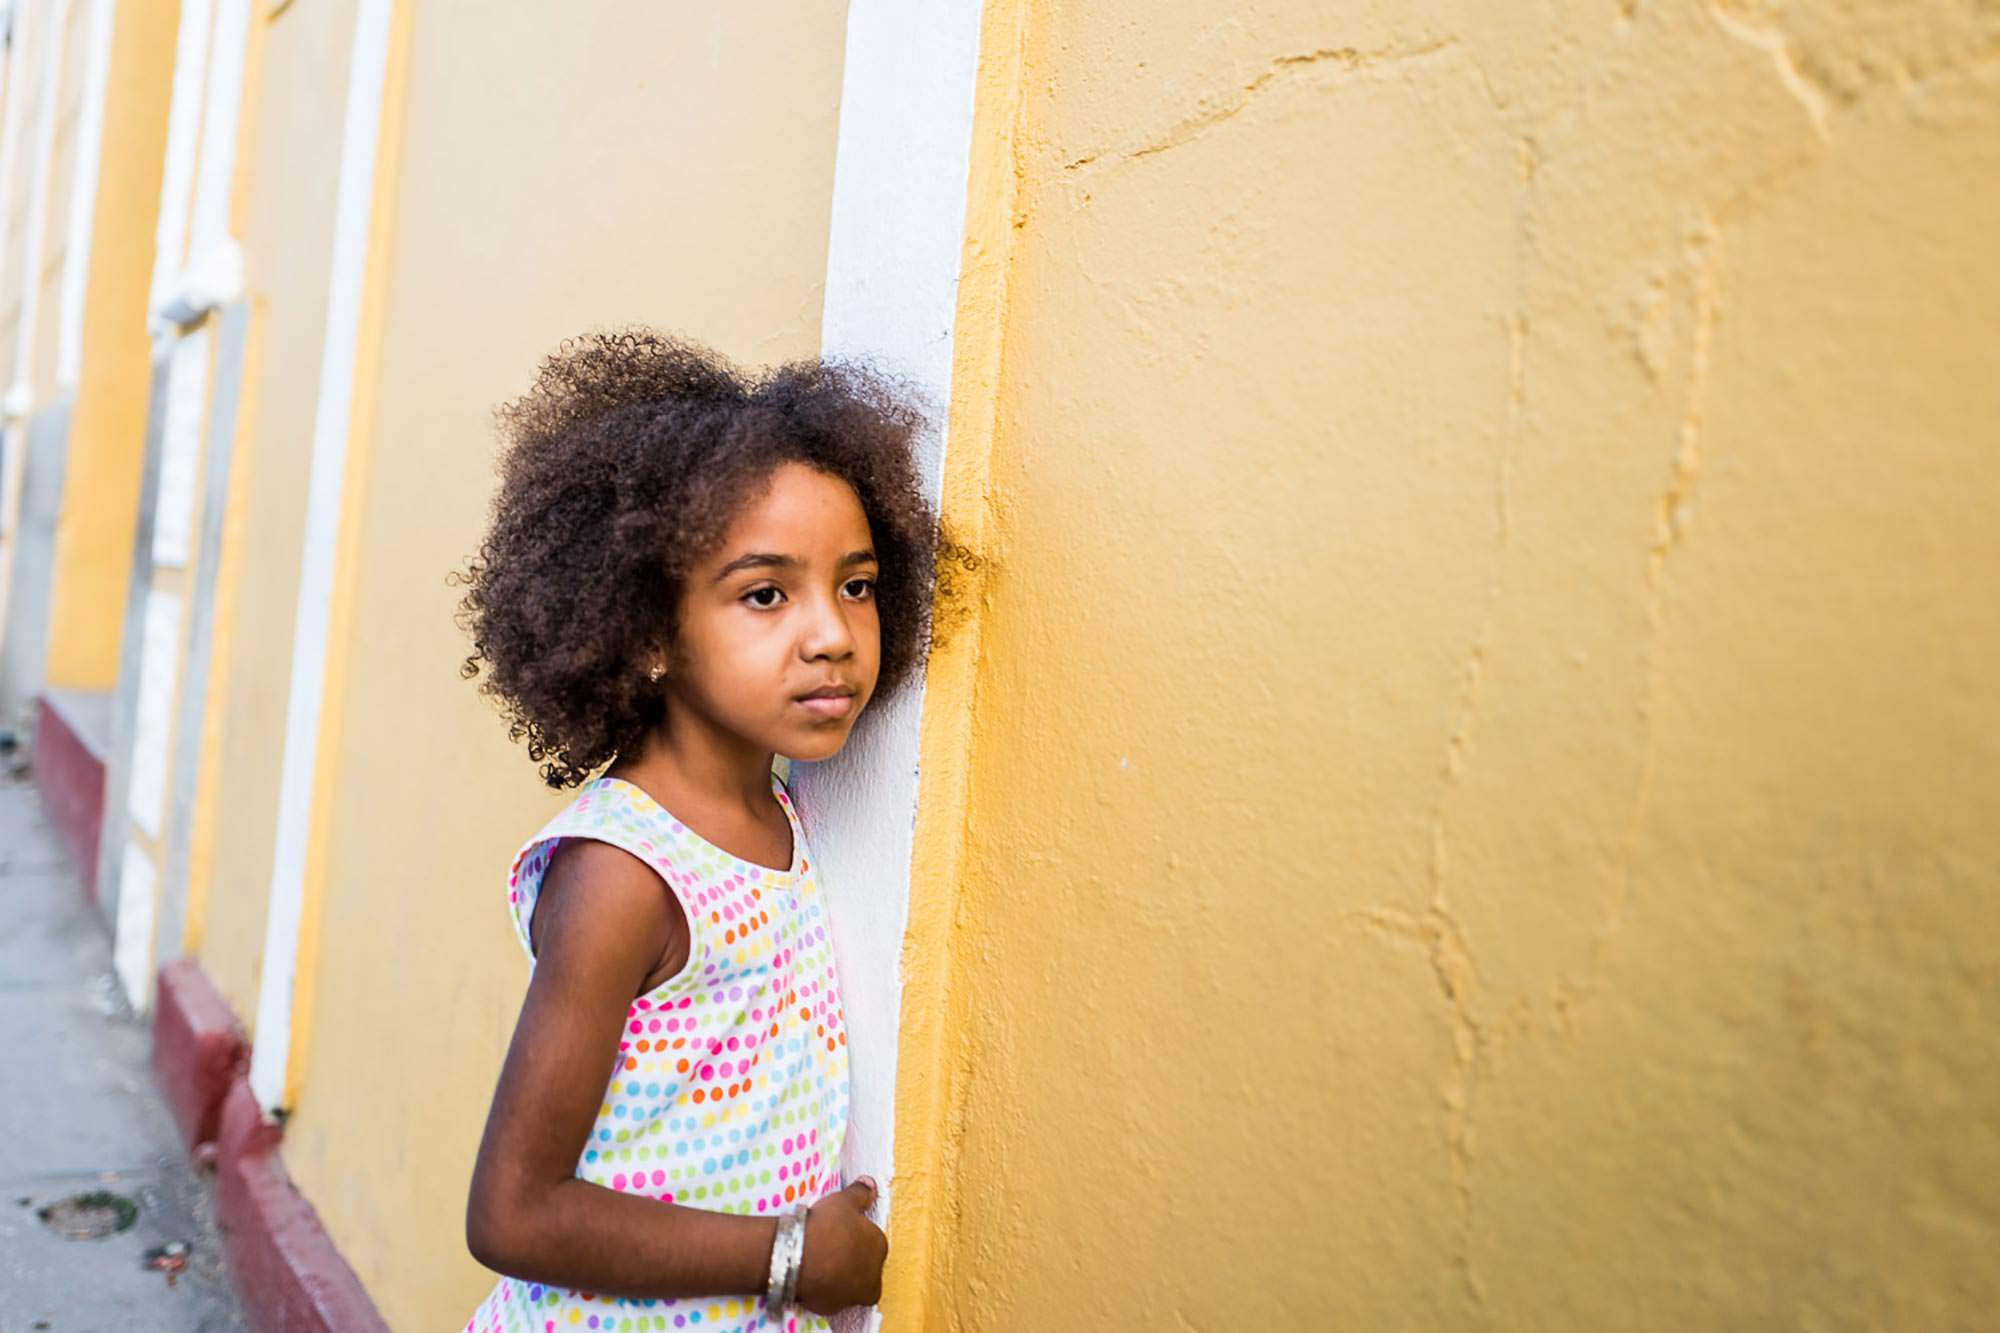 Cuba-Fotoshooting-thome-17